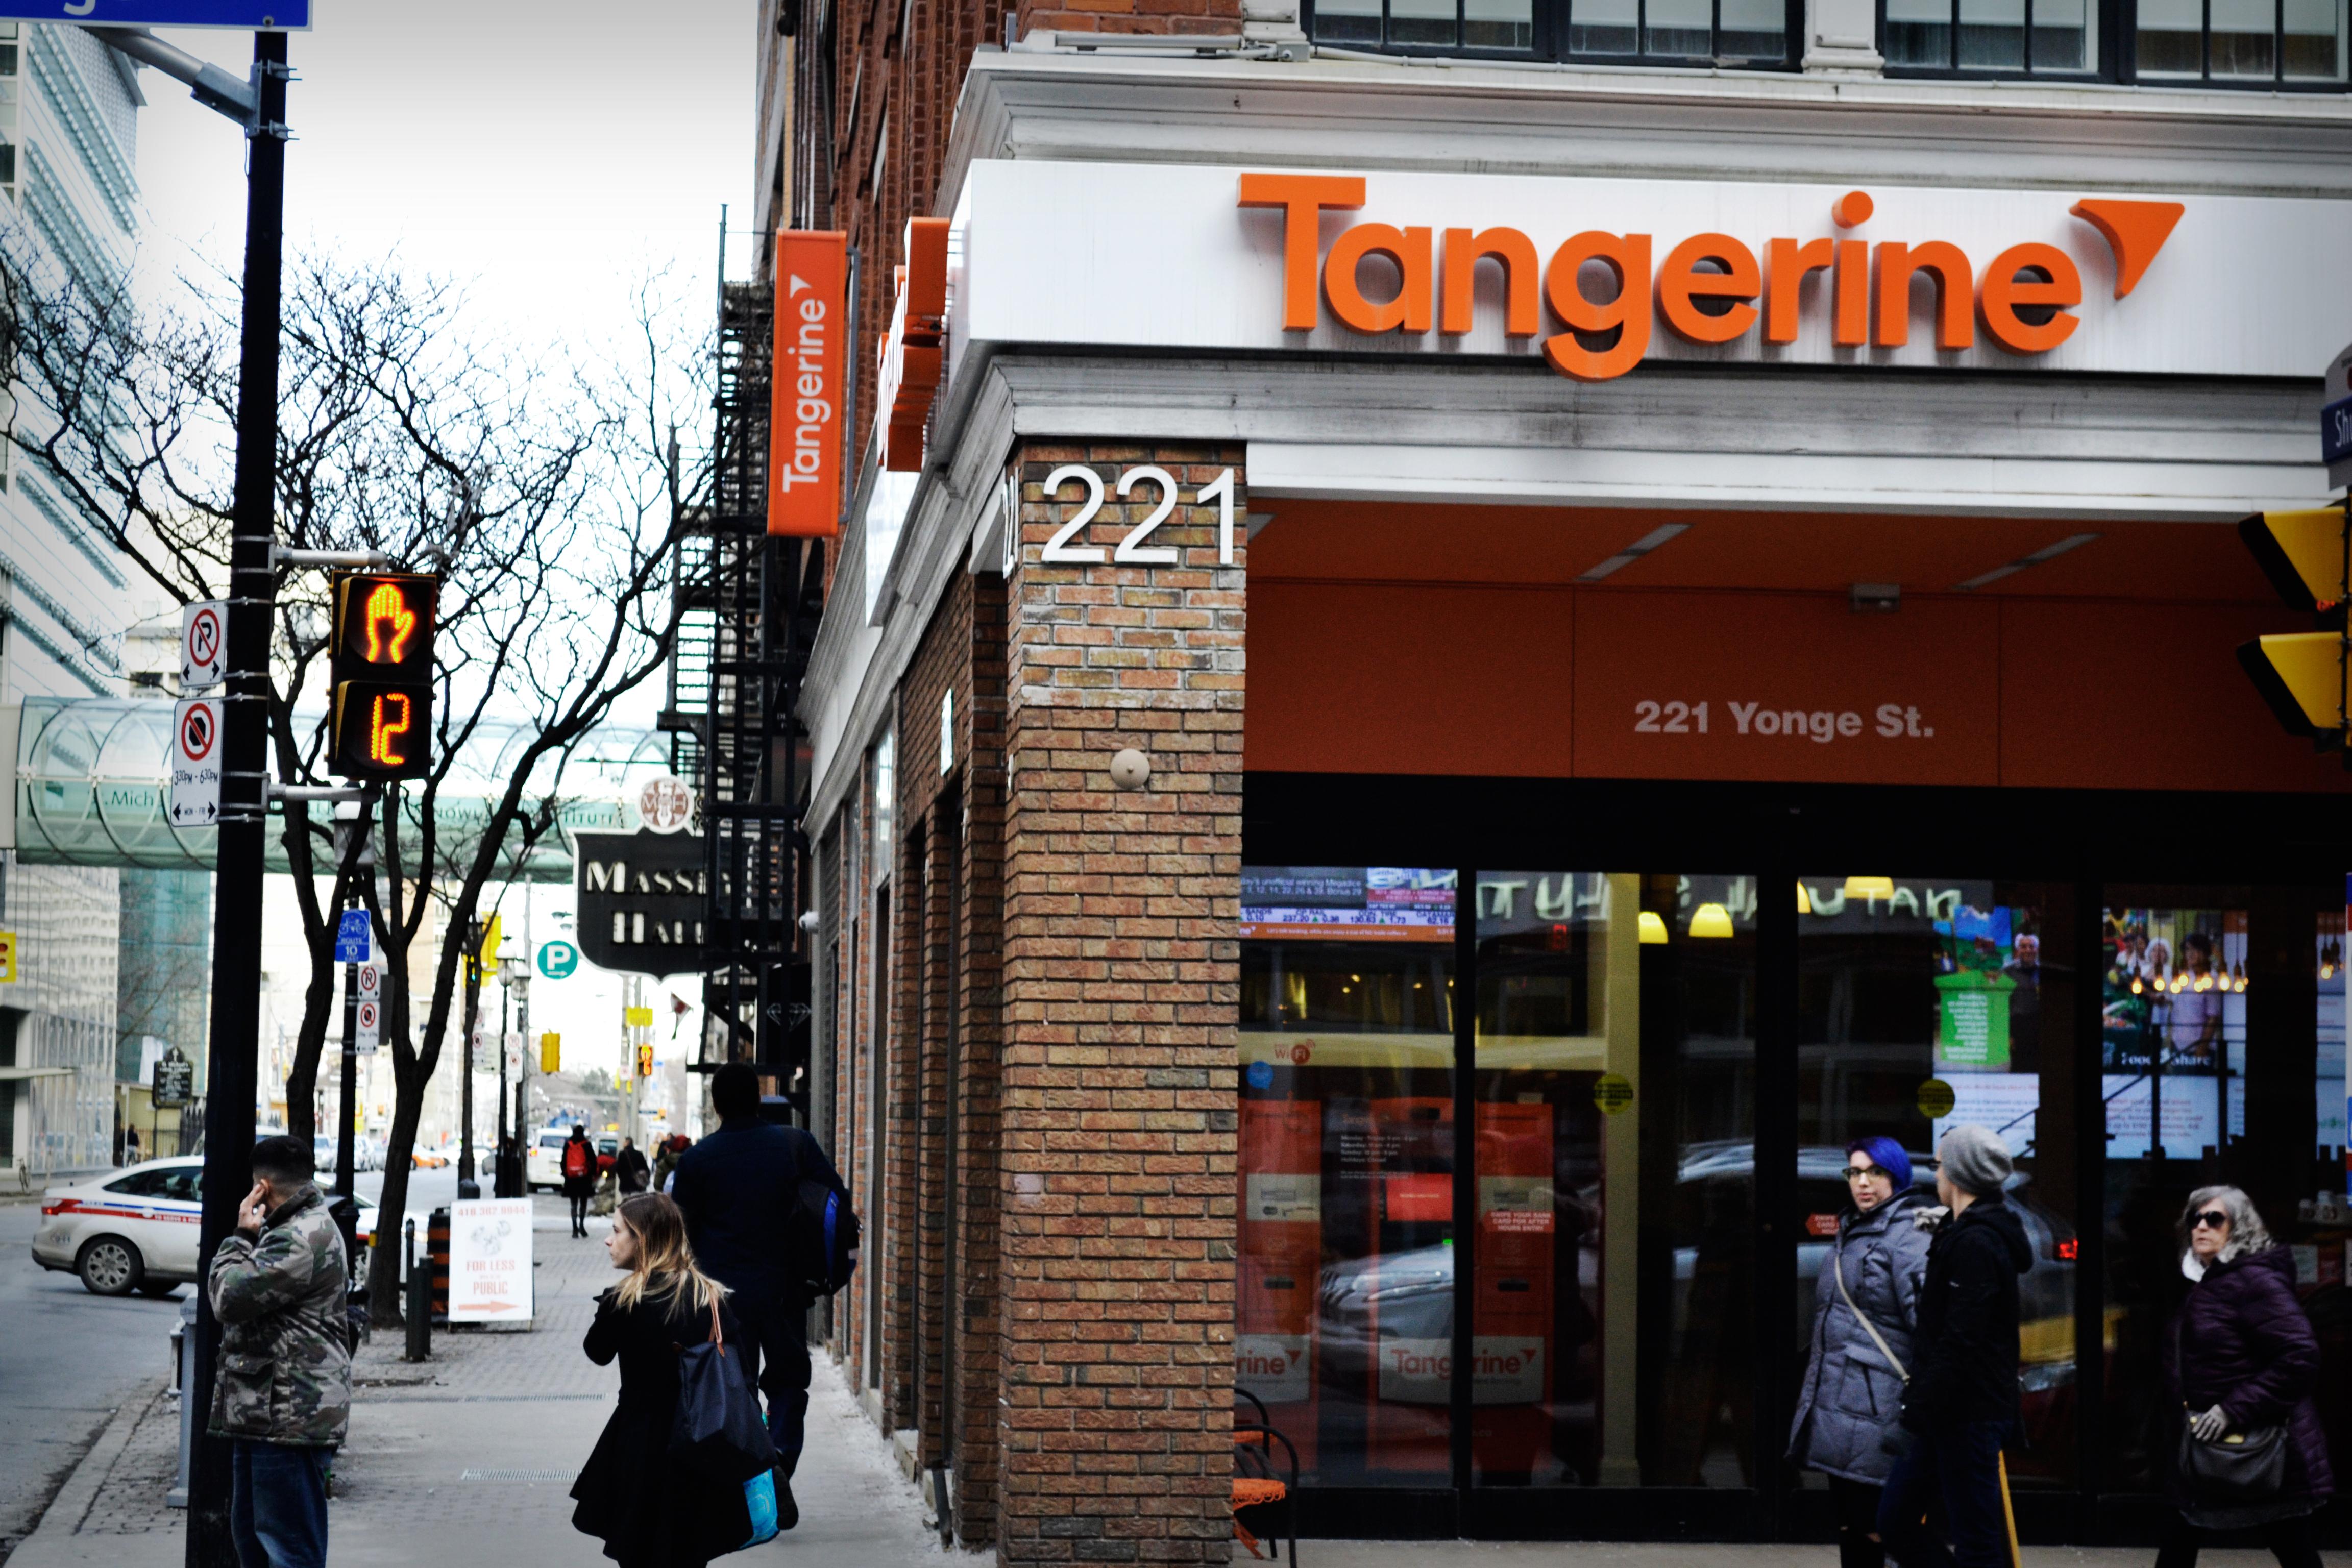 Tangerine Bank - Wikipedia